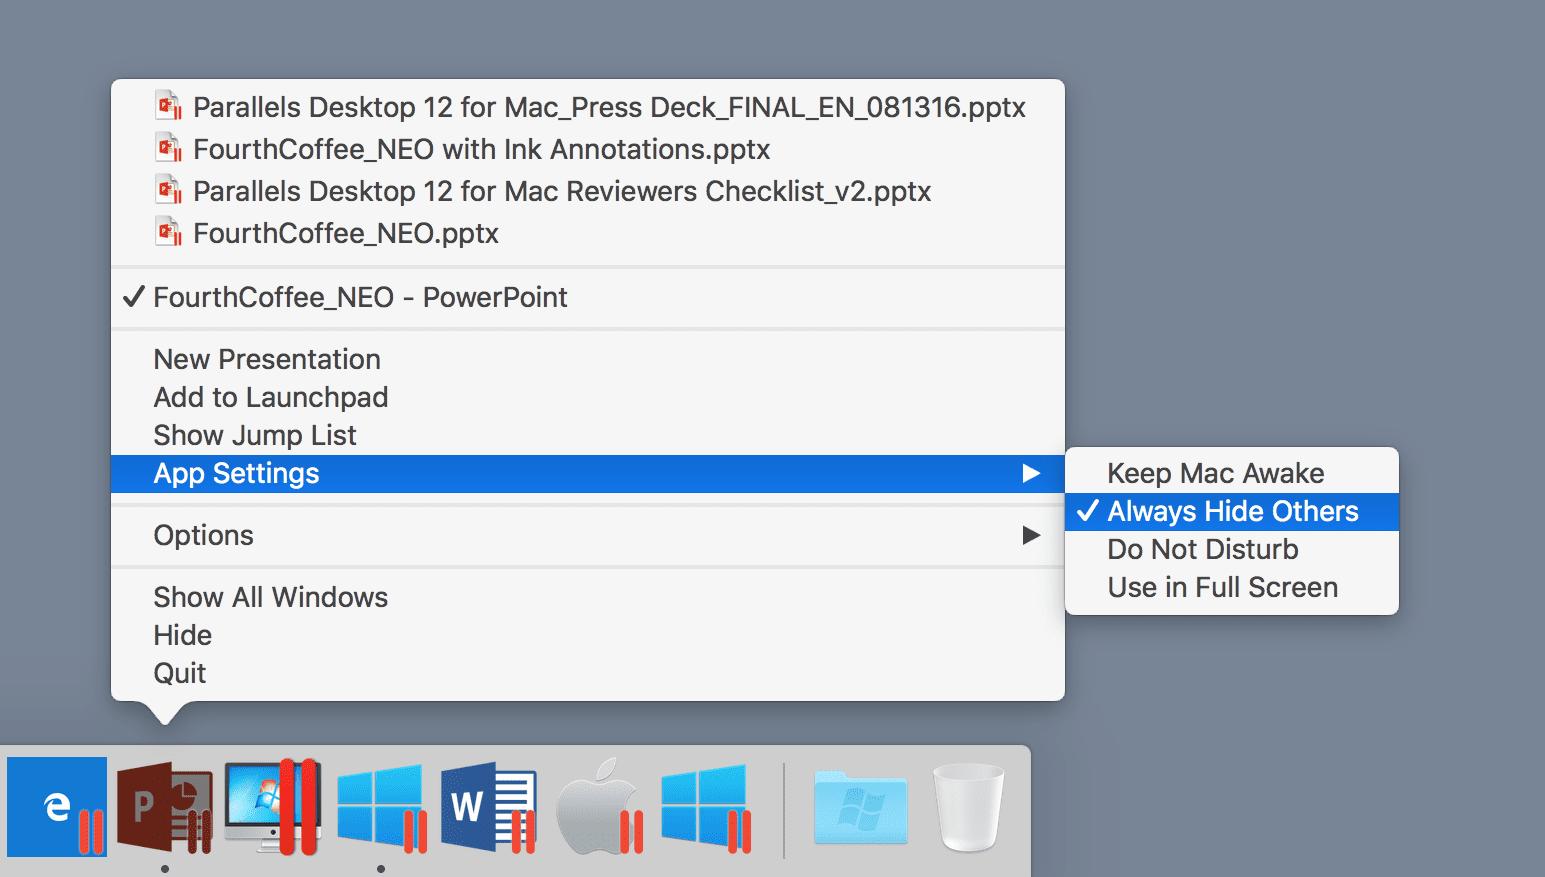 Performance Improvements in Parallels Desktop 12